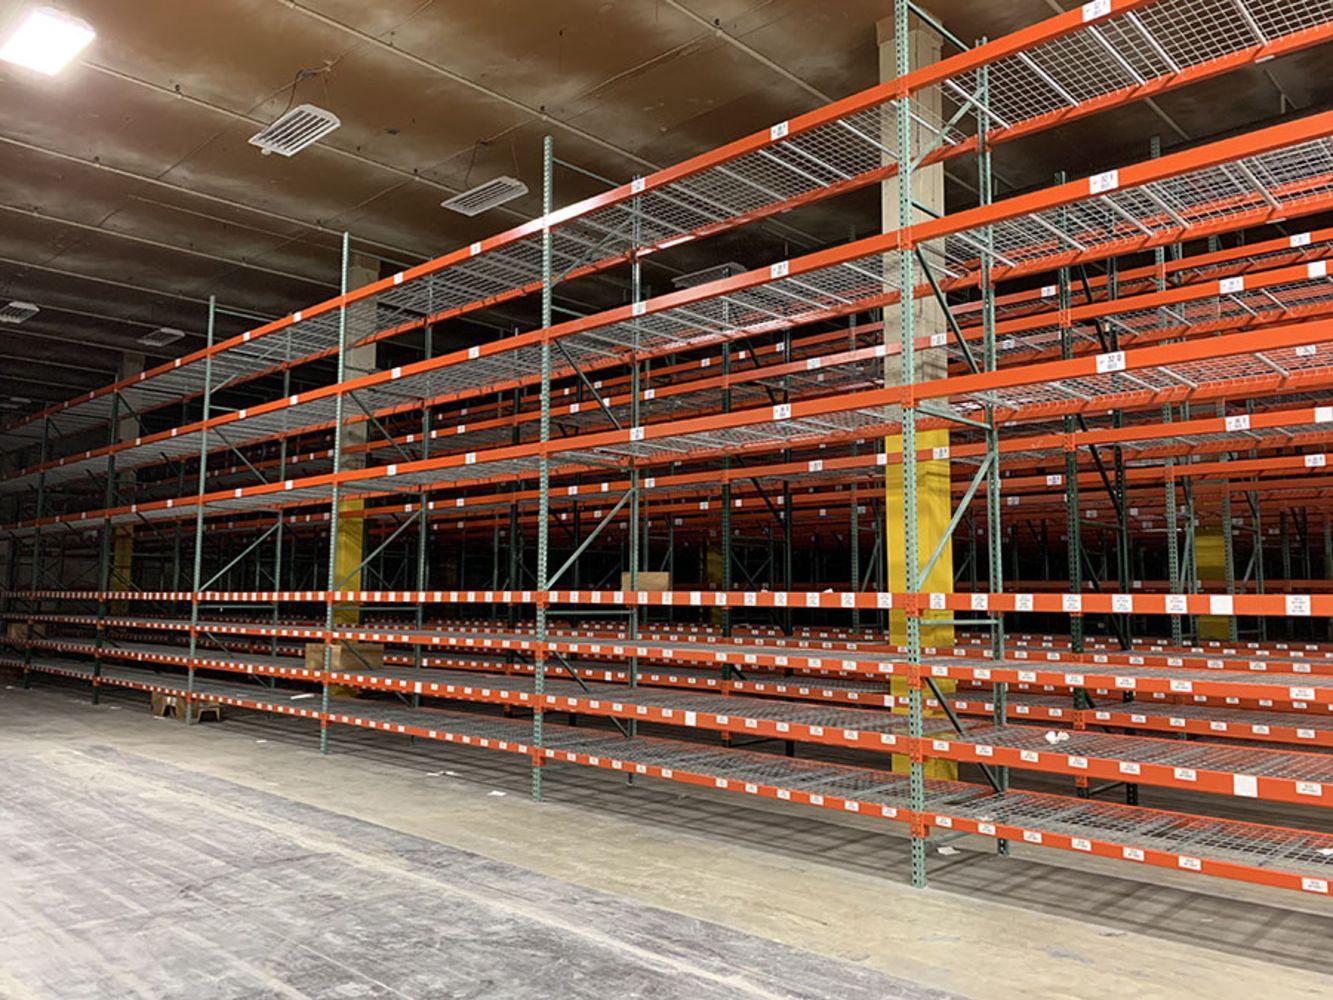 Venus Fashion, Inc. - Exceptionally Clean 350,000 SF Distribution Center